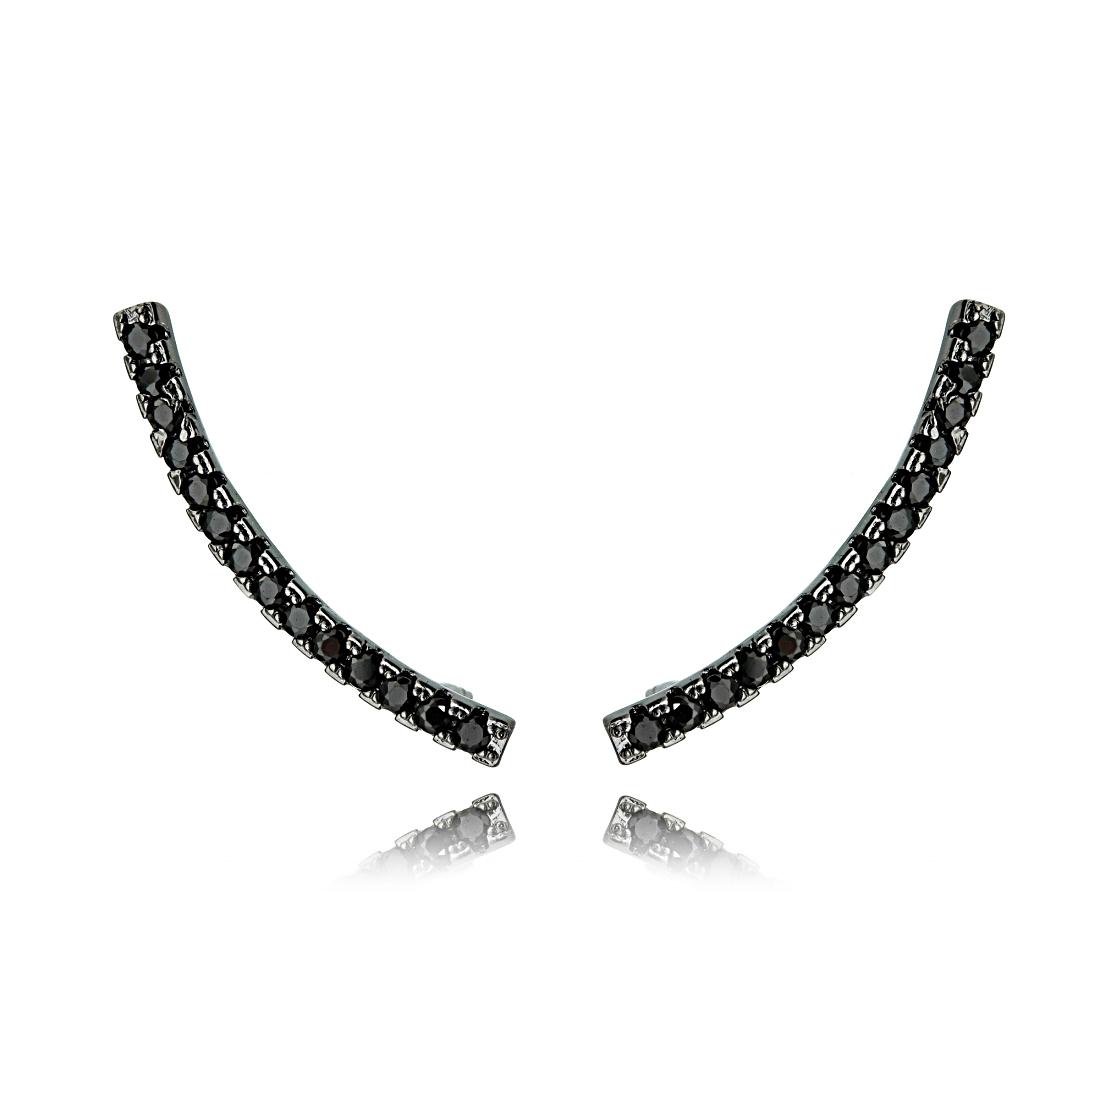 Ear Cuff Palito Semijoia Ródio Negro com Zircônia Negra  - Soloyou